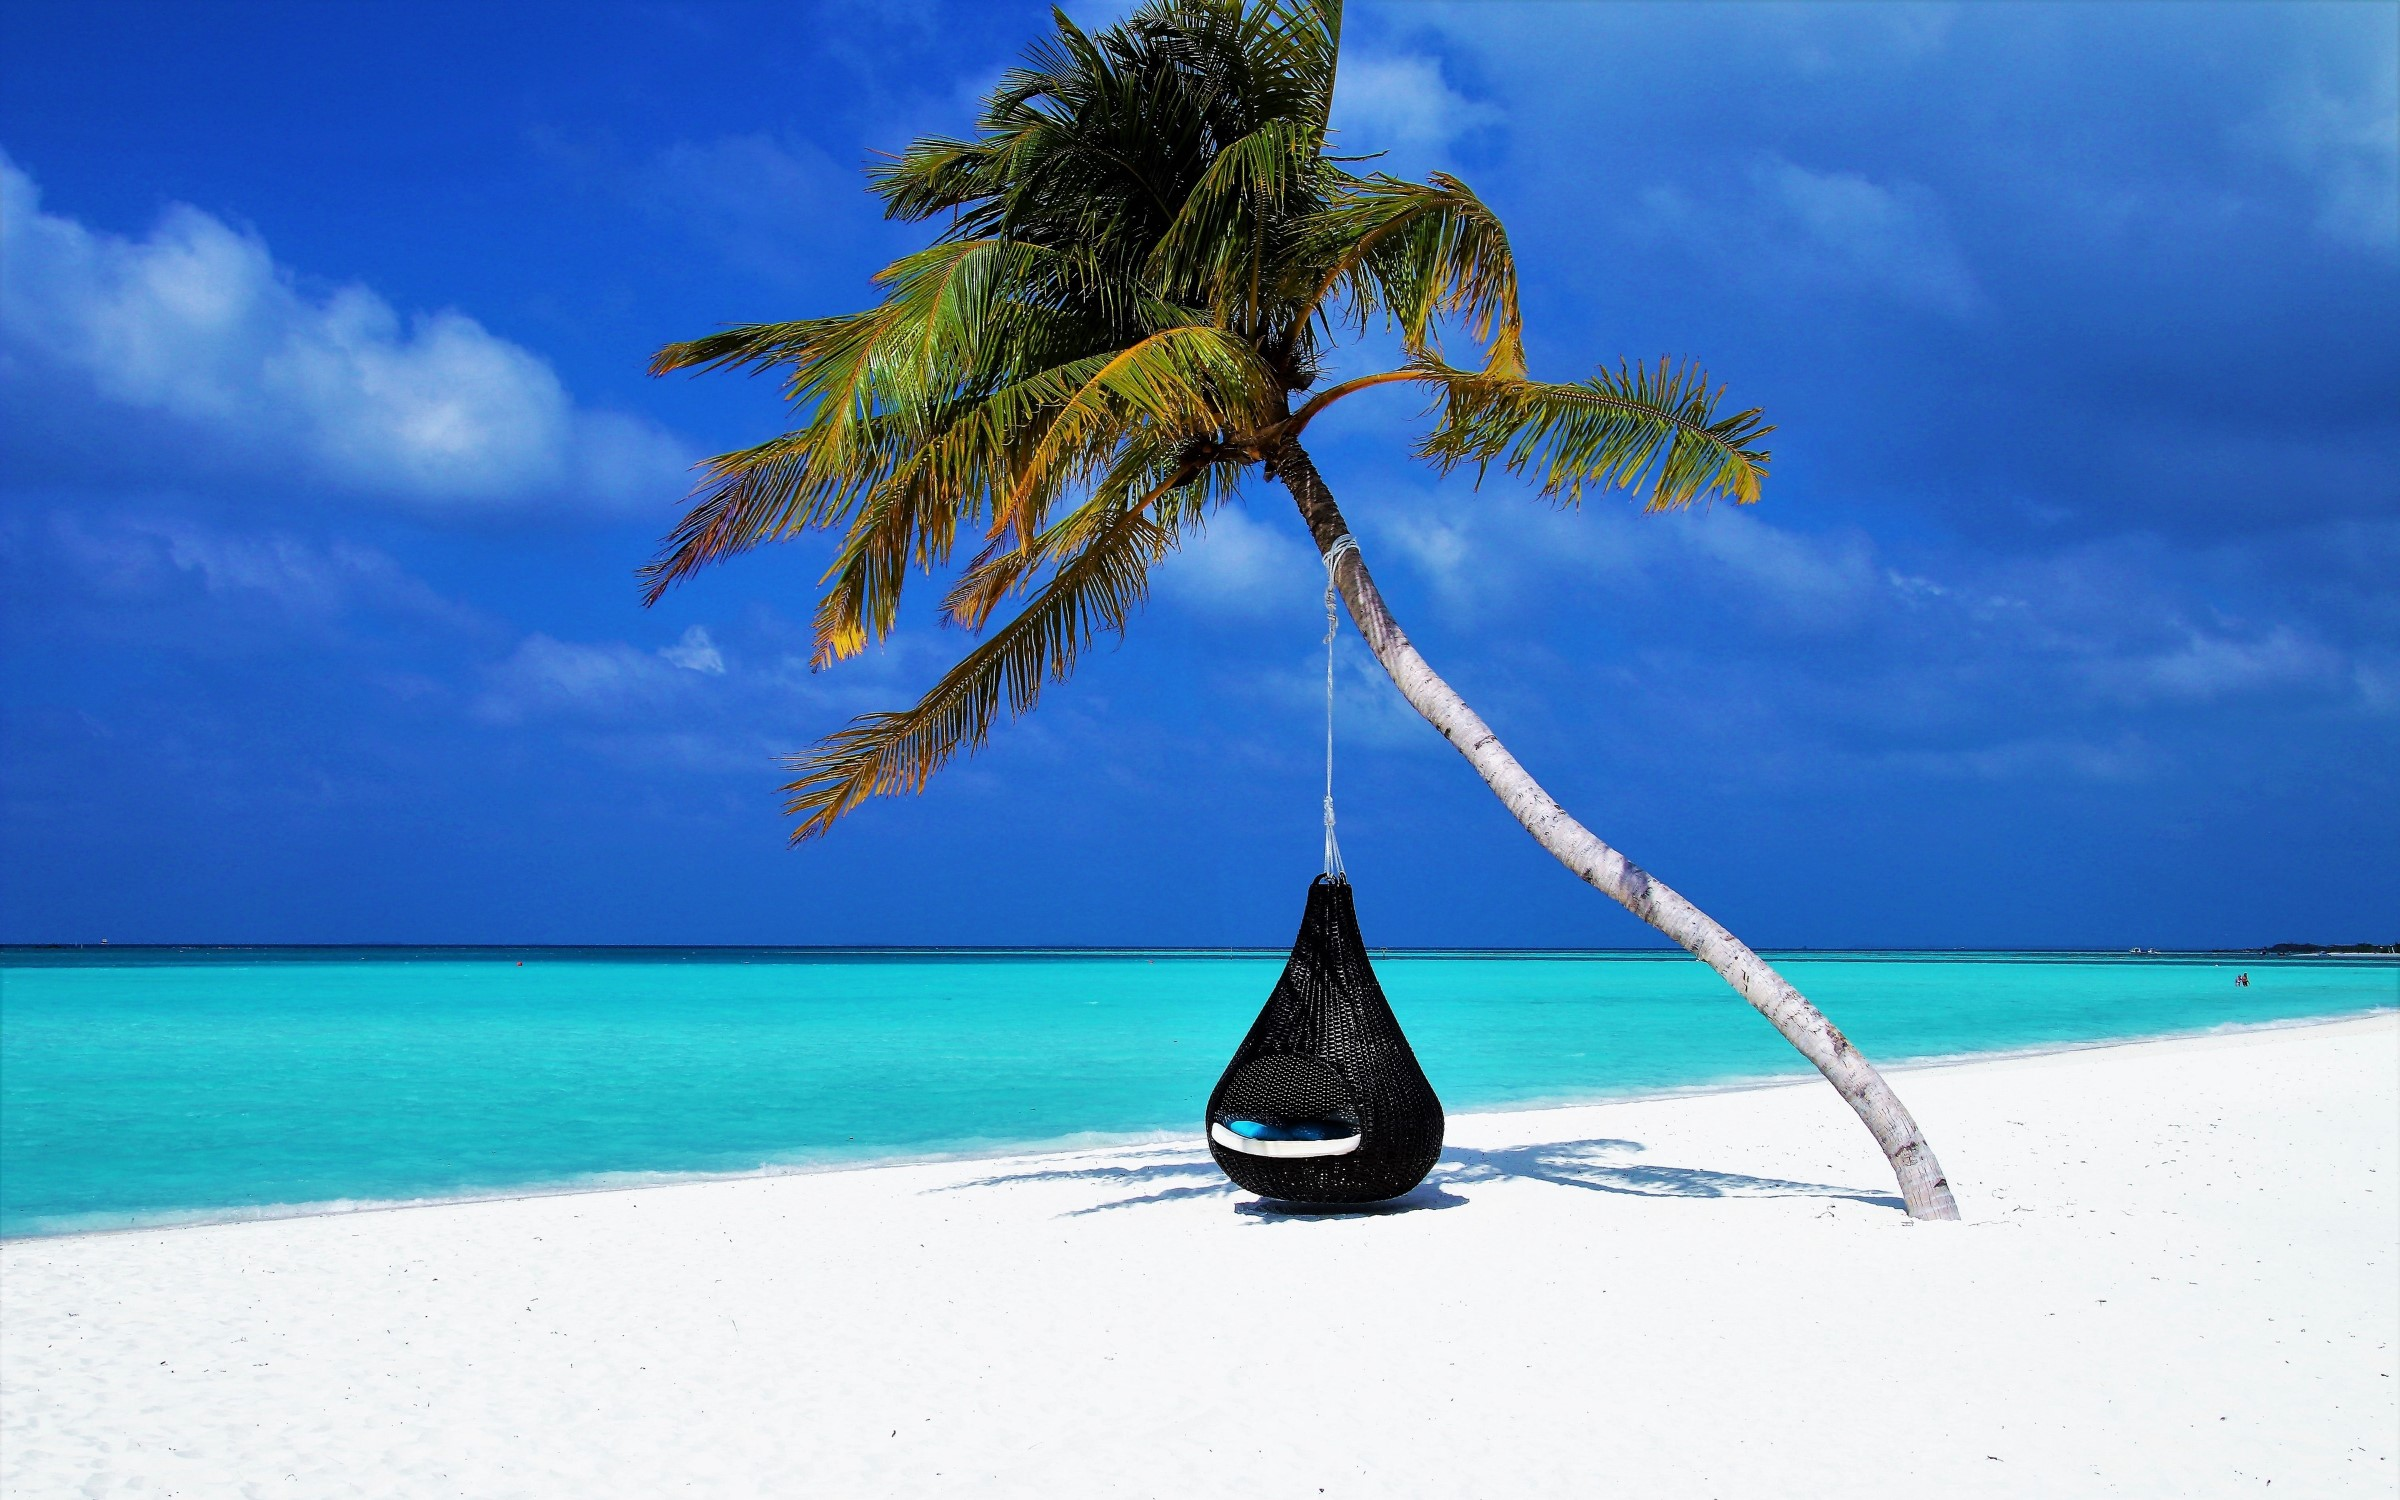 Palm tree with a hammock on a beach